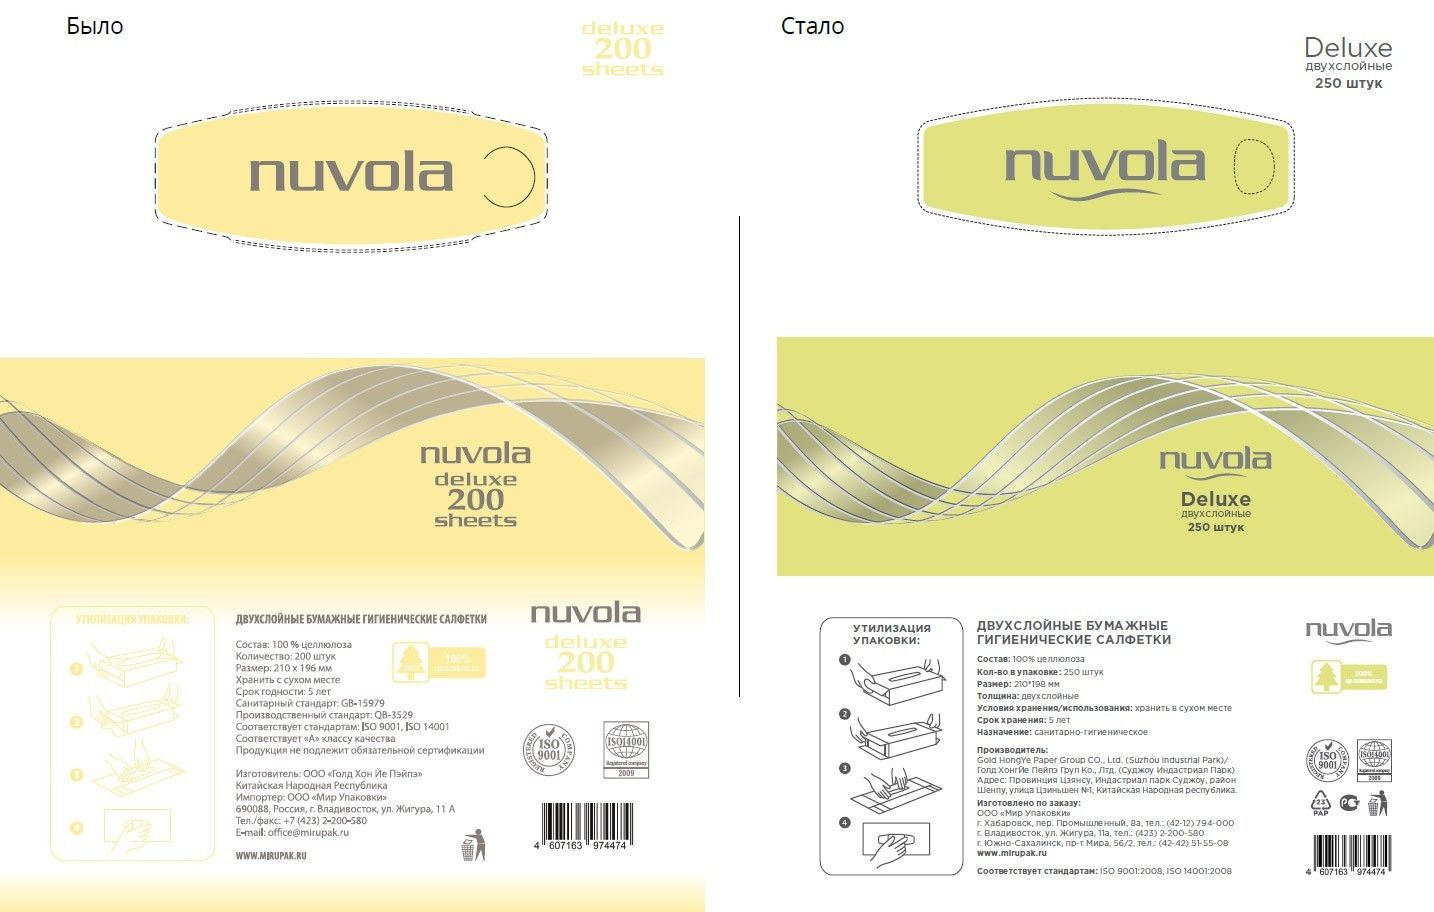 Разработка дизайна упаковки салфеток Nuvola